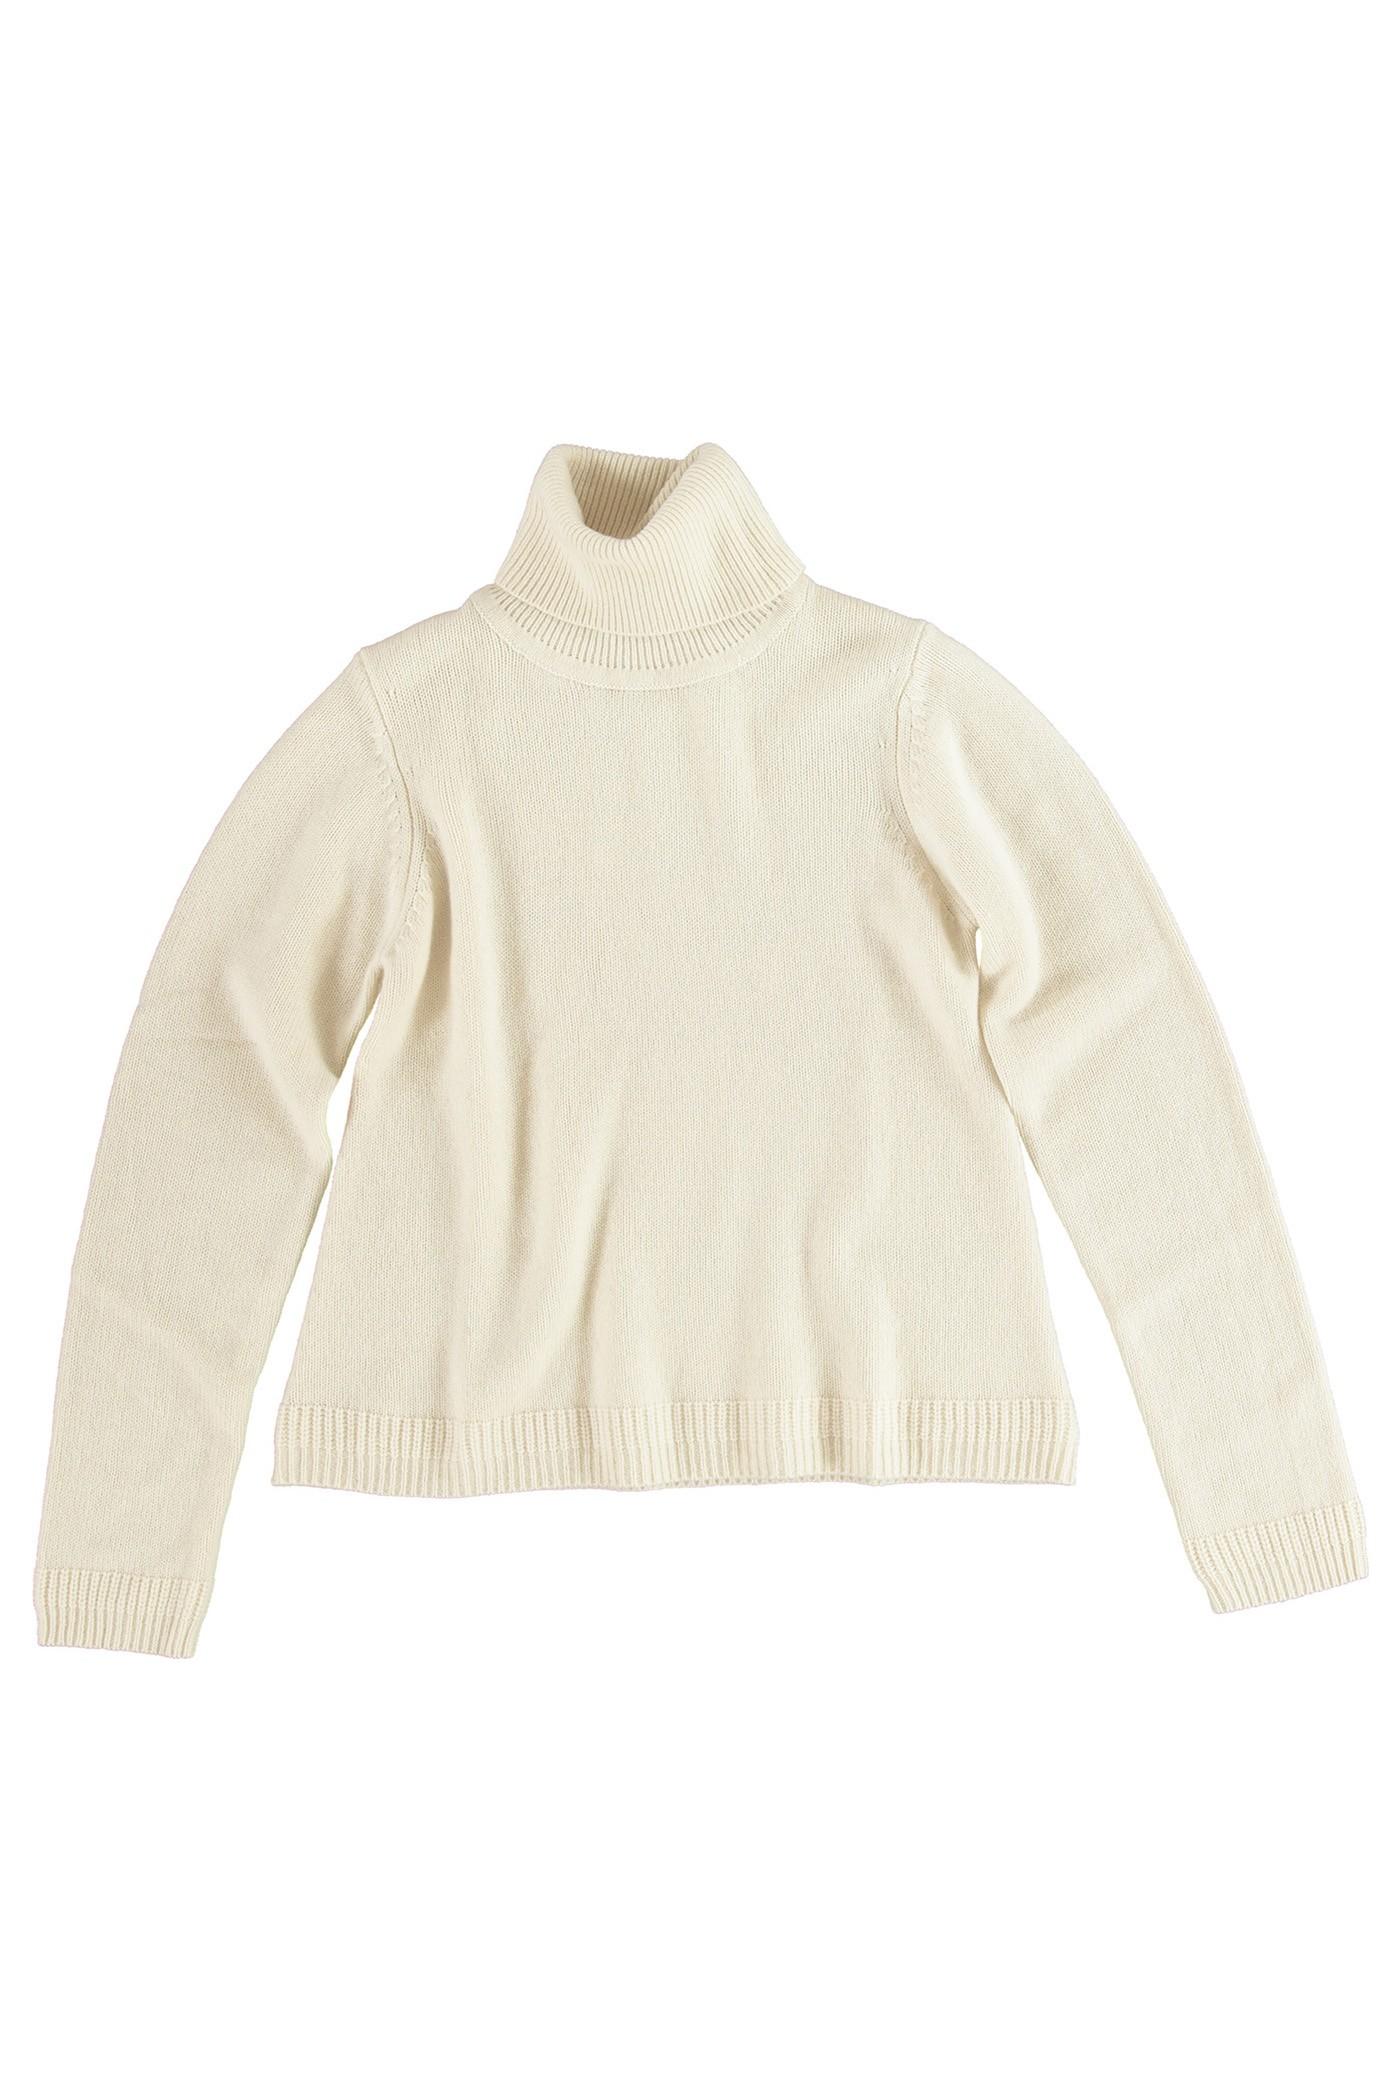 coco-amande-f16-cavadesoi-knitwear.jpg